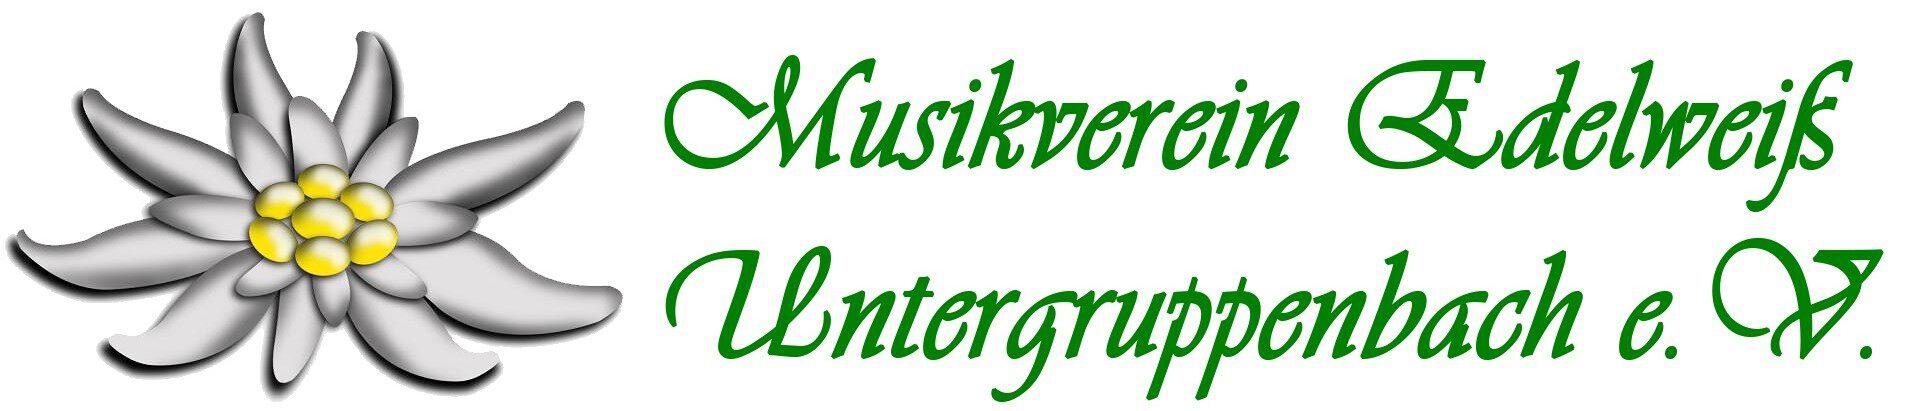 MV Edelweiss Untergruppenbach e.V.